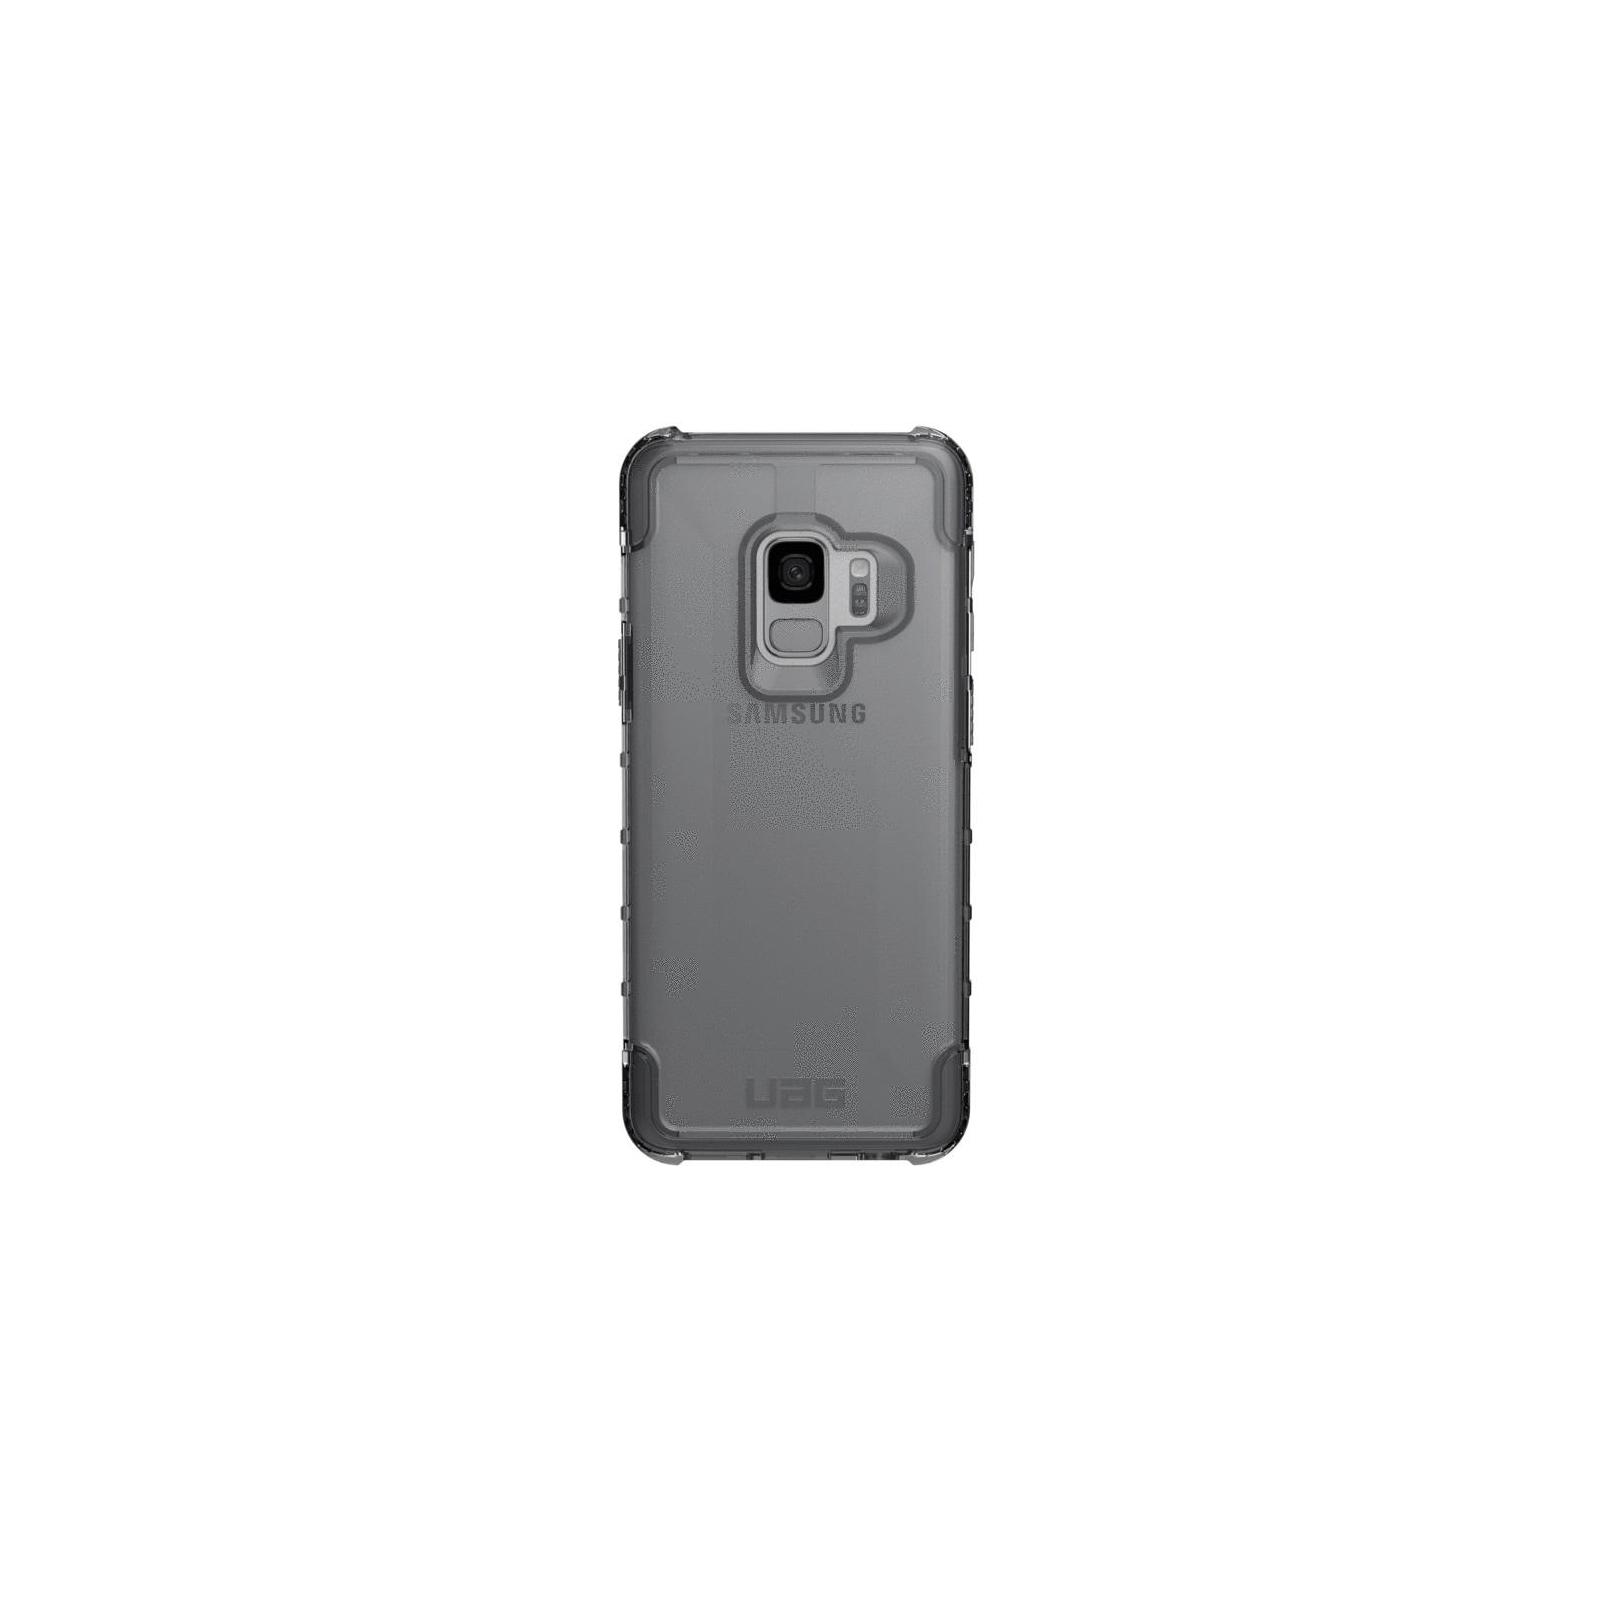 Чехол для моб. телефона Uag Galaxy S9 Plyo Ice (GLXS9-Y-IC)